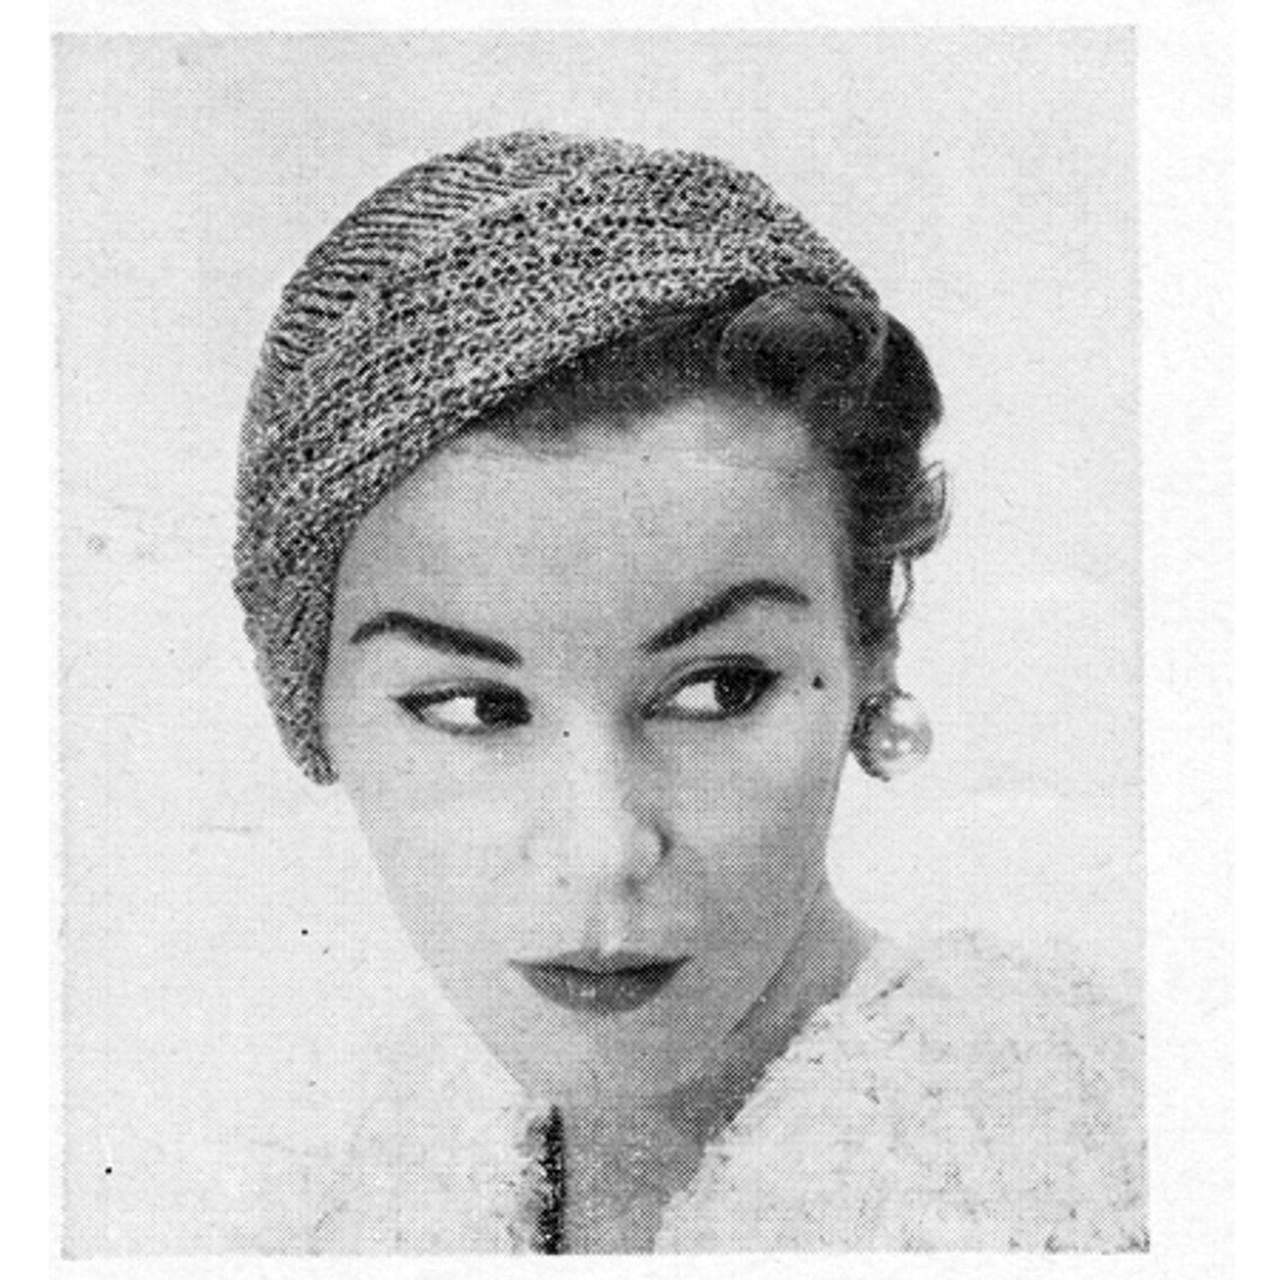 Cloche Hat Knitting Pattern with Metallic Threads